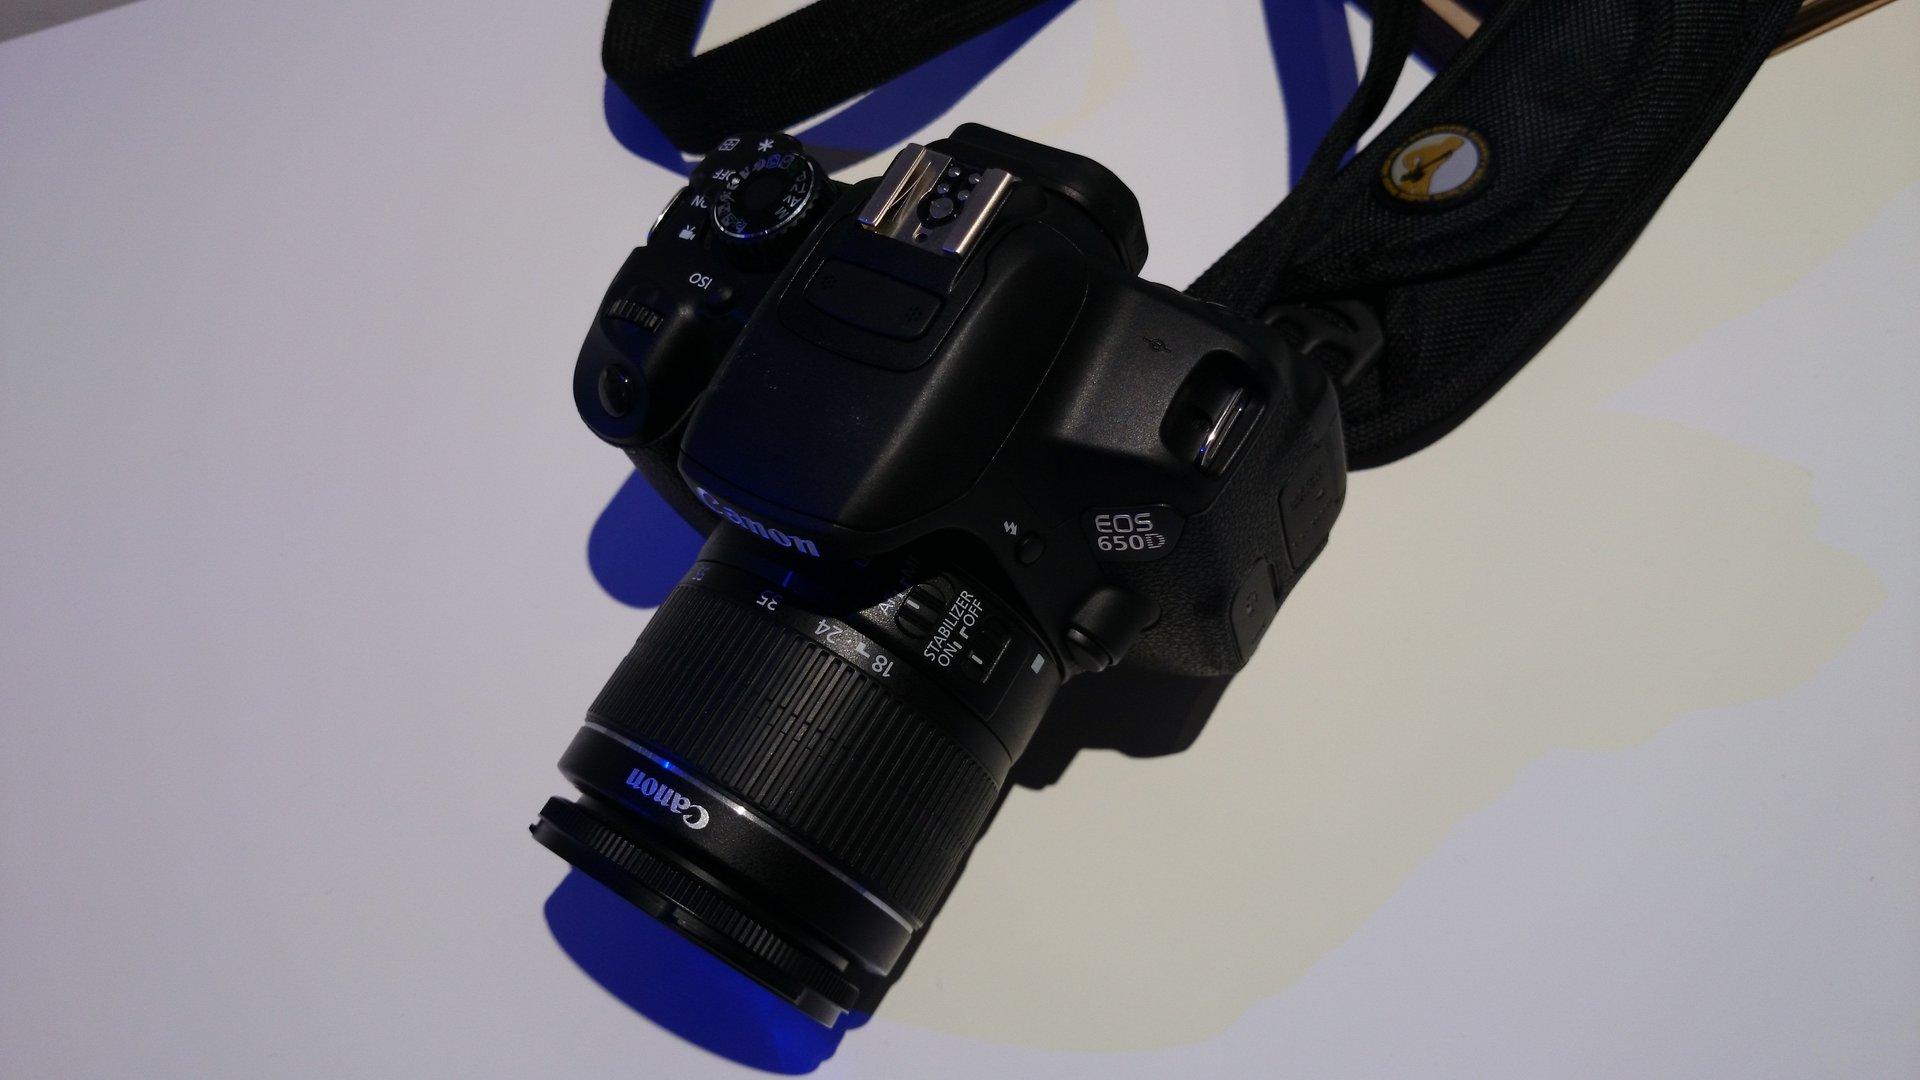 Sony Xperia Z1 – Kamera (Rückseite)